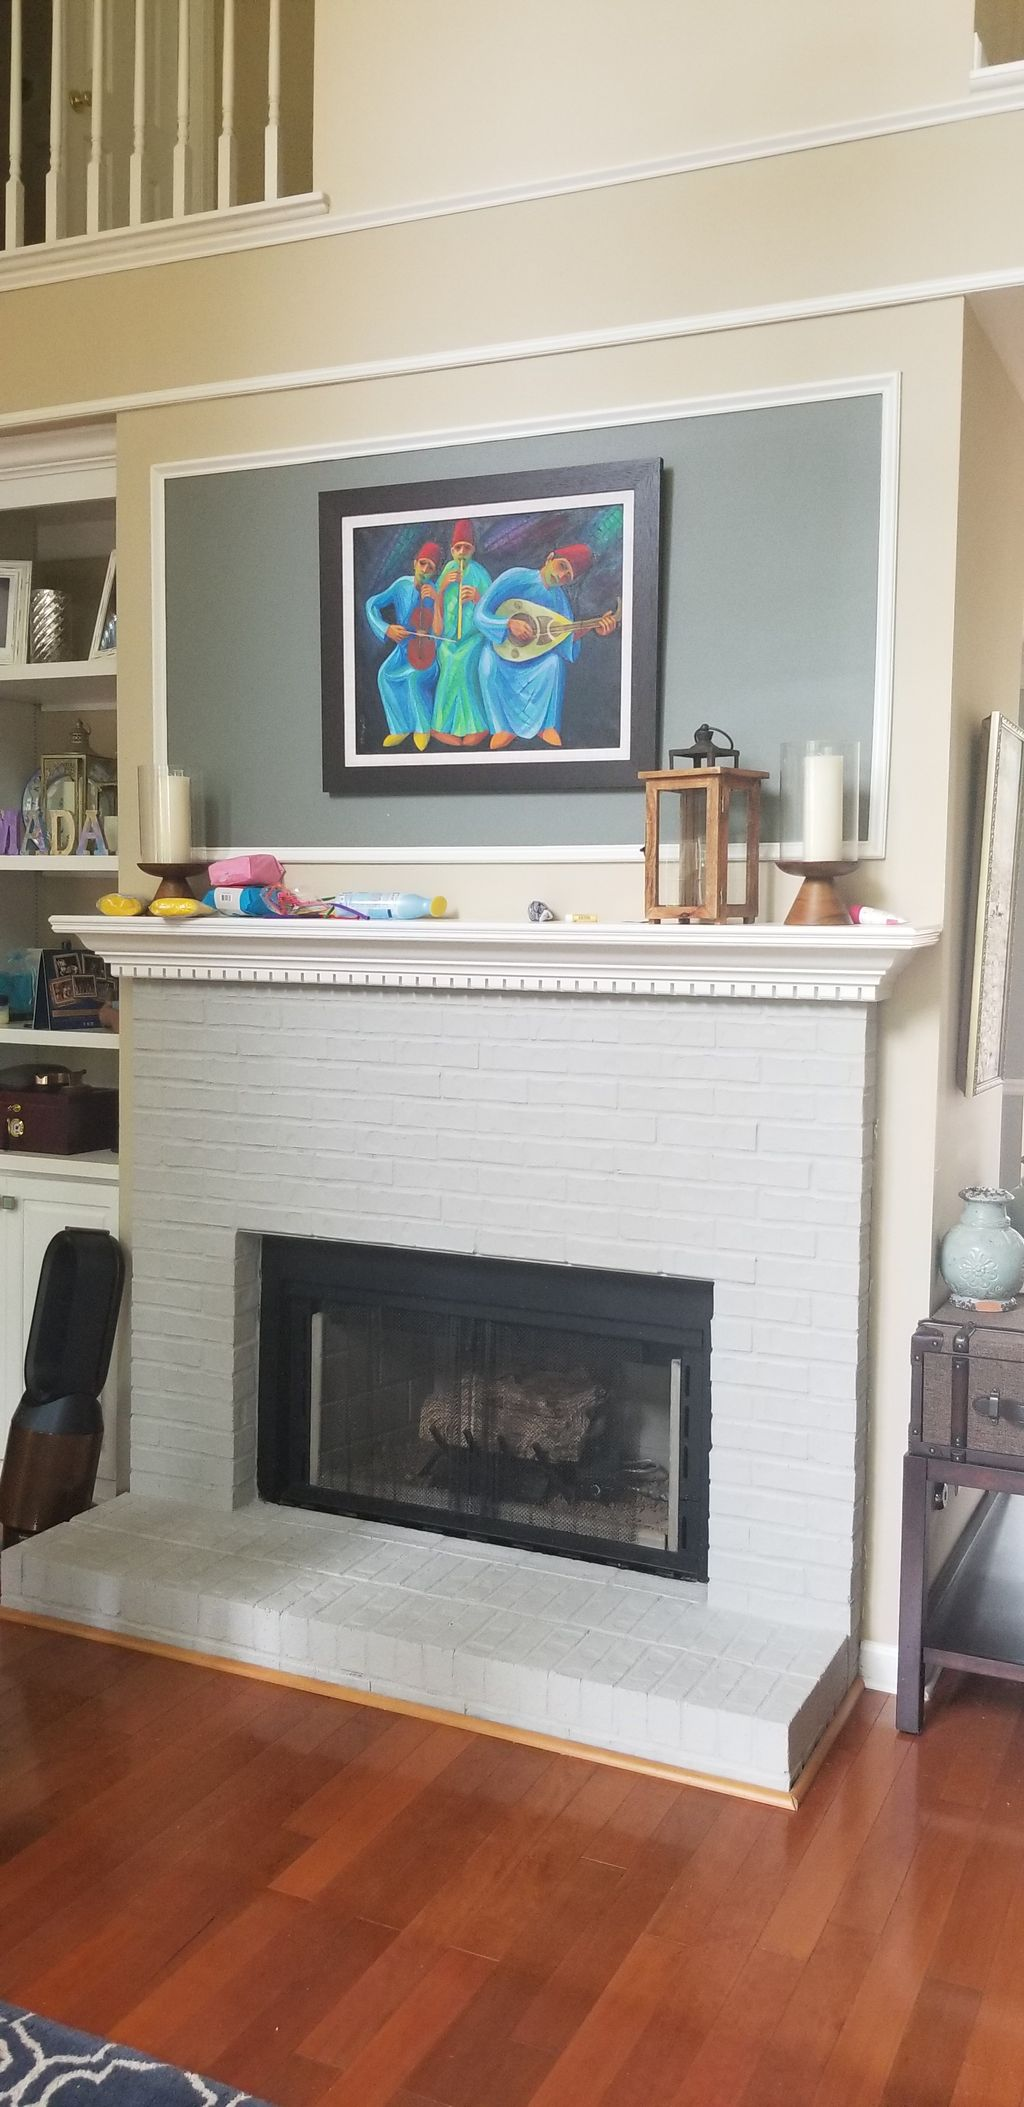 MORE PICS TO COME  Interior Paint -FULL-Walls, Trim, Ceiling PLUS